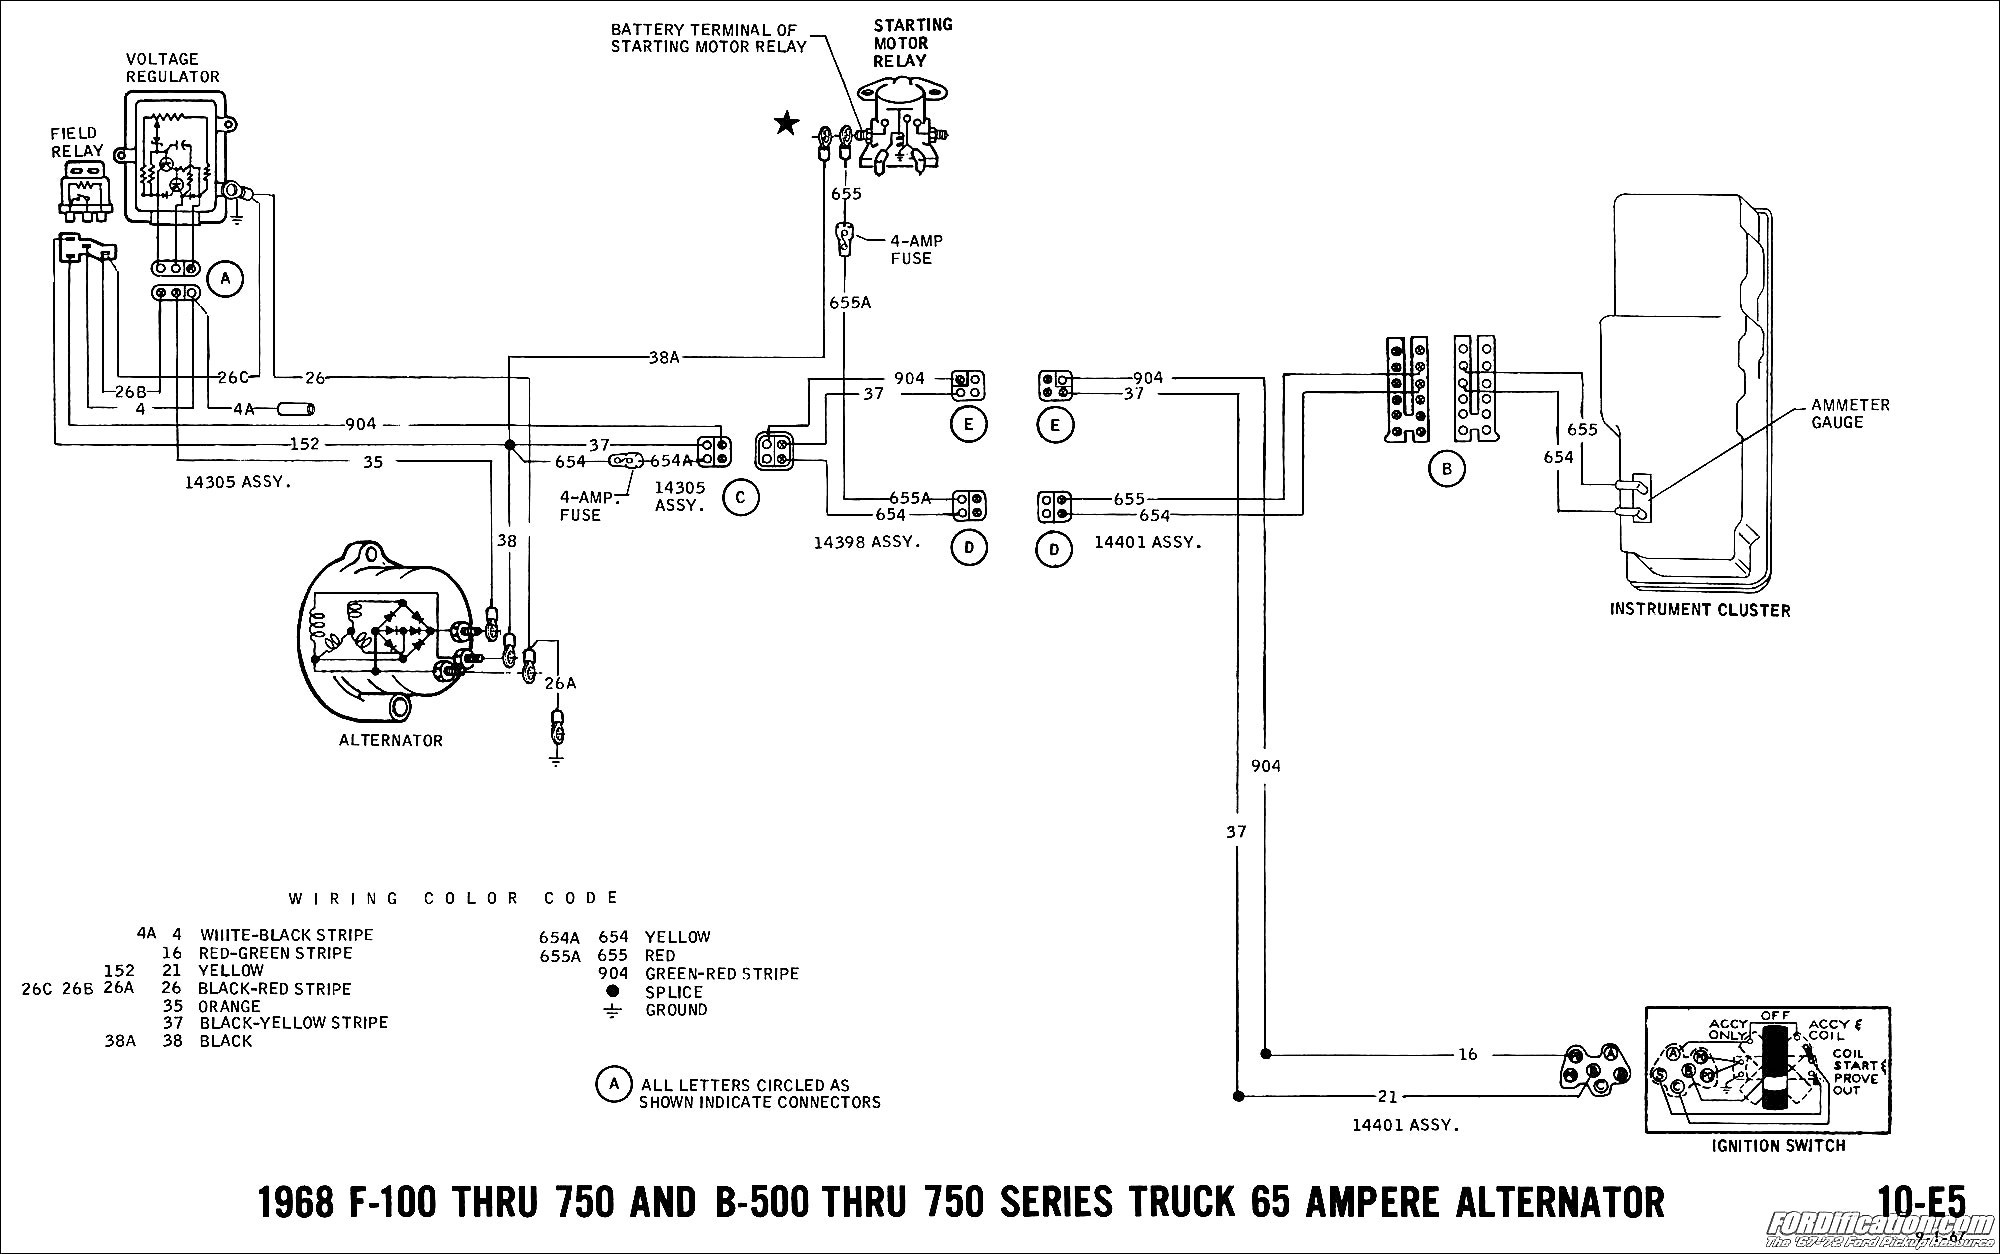 Delco Alternator Wiring Diagram Wiring Diagram Alternator ford Fresh Wiring Diagram Alternator ford Of Delco Alternator Wiring Diagram